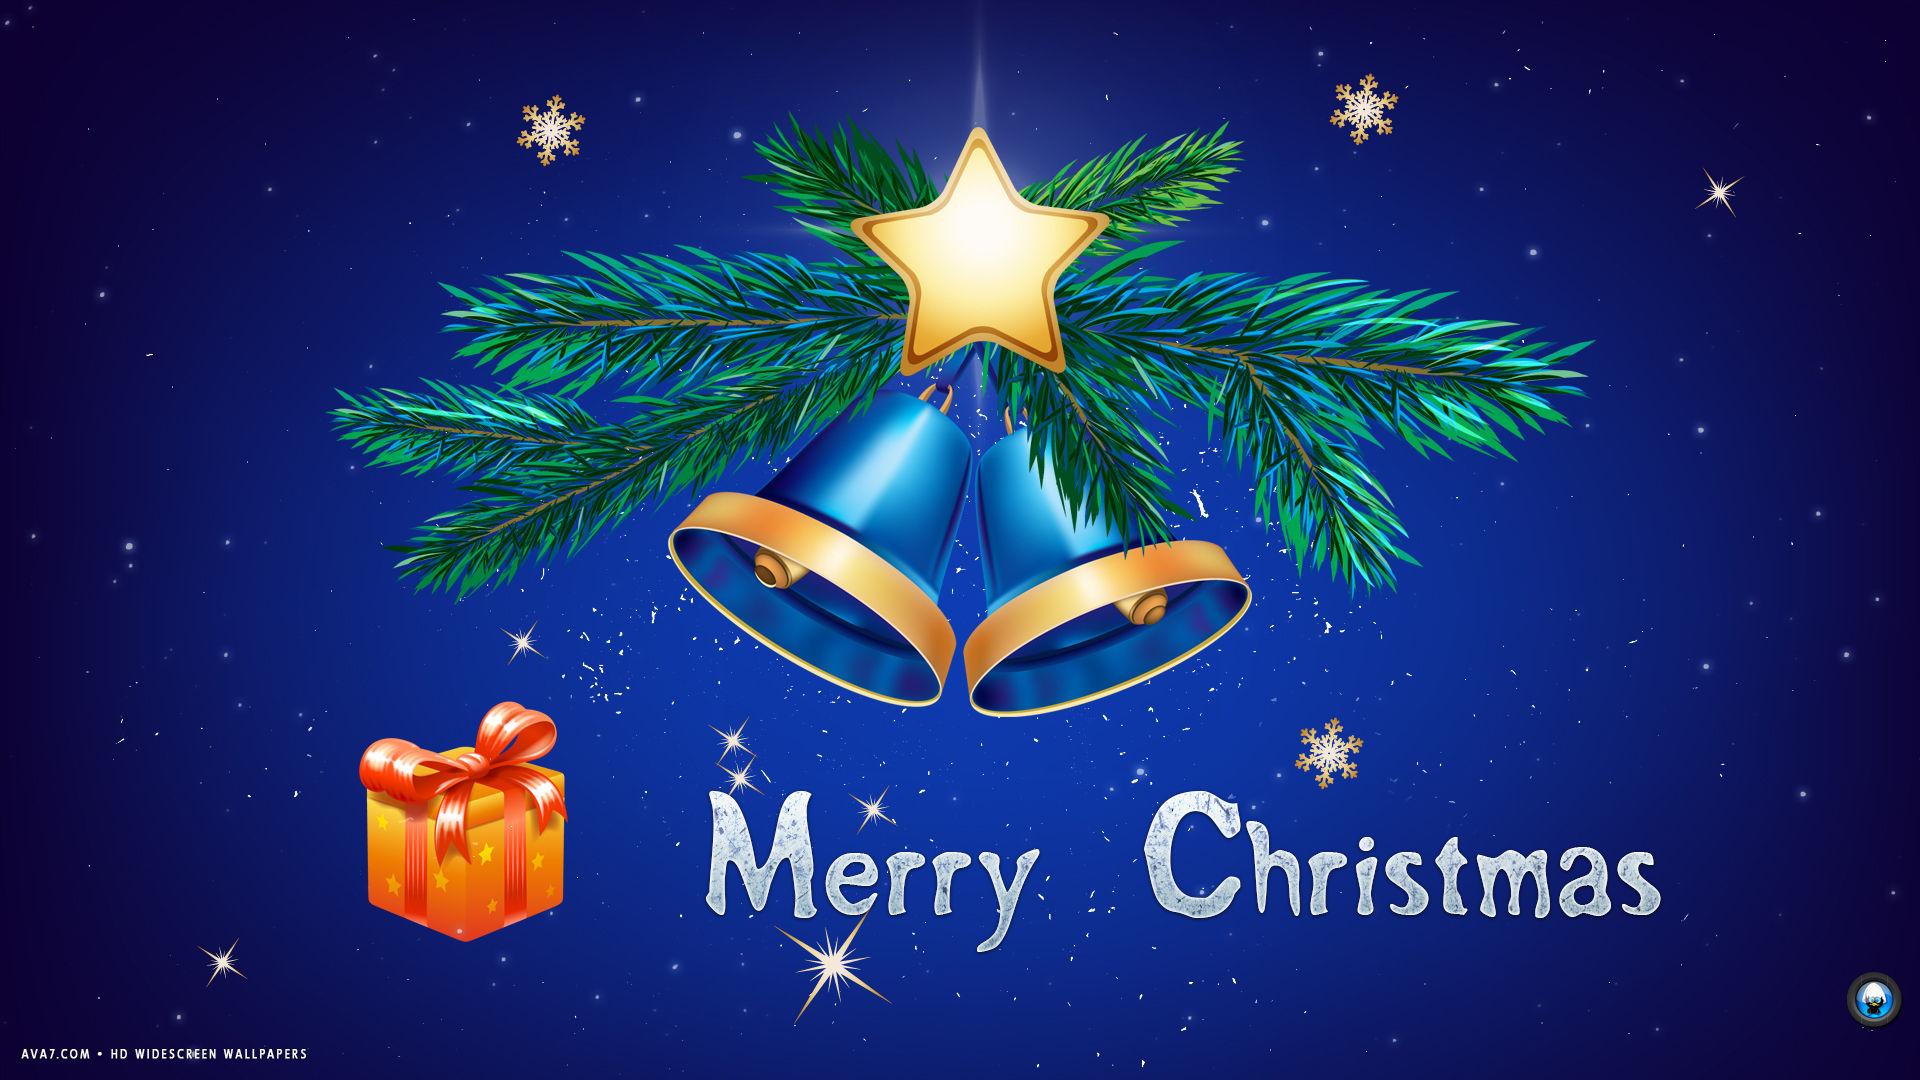 merry christmas blue bells present stars holiday